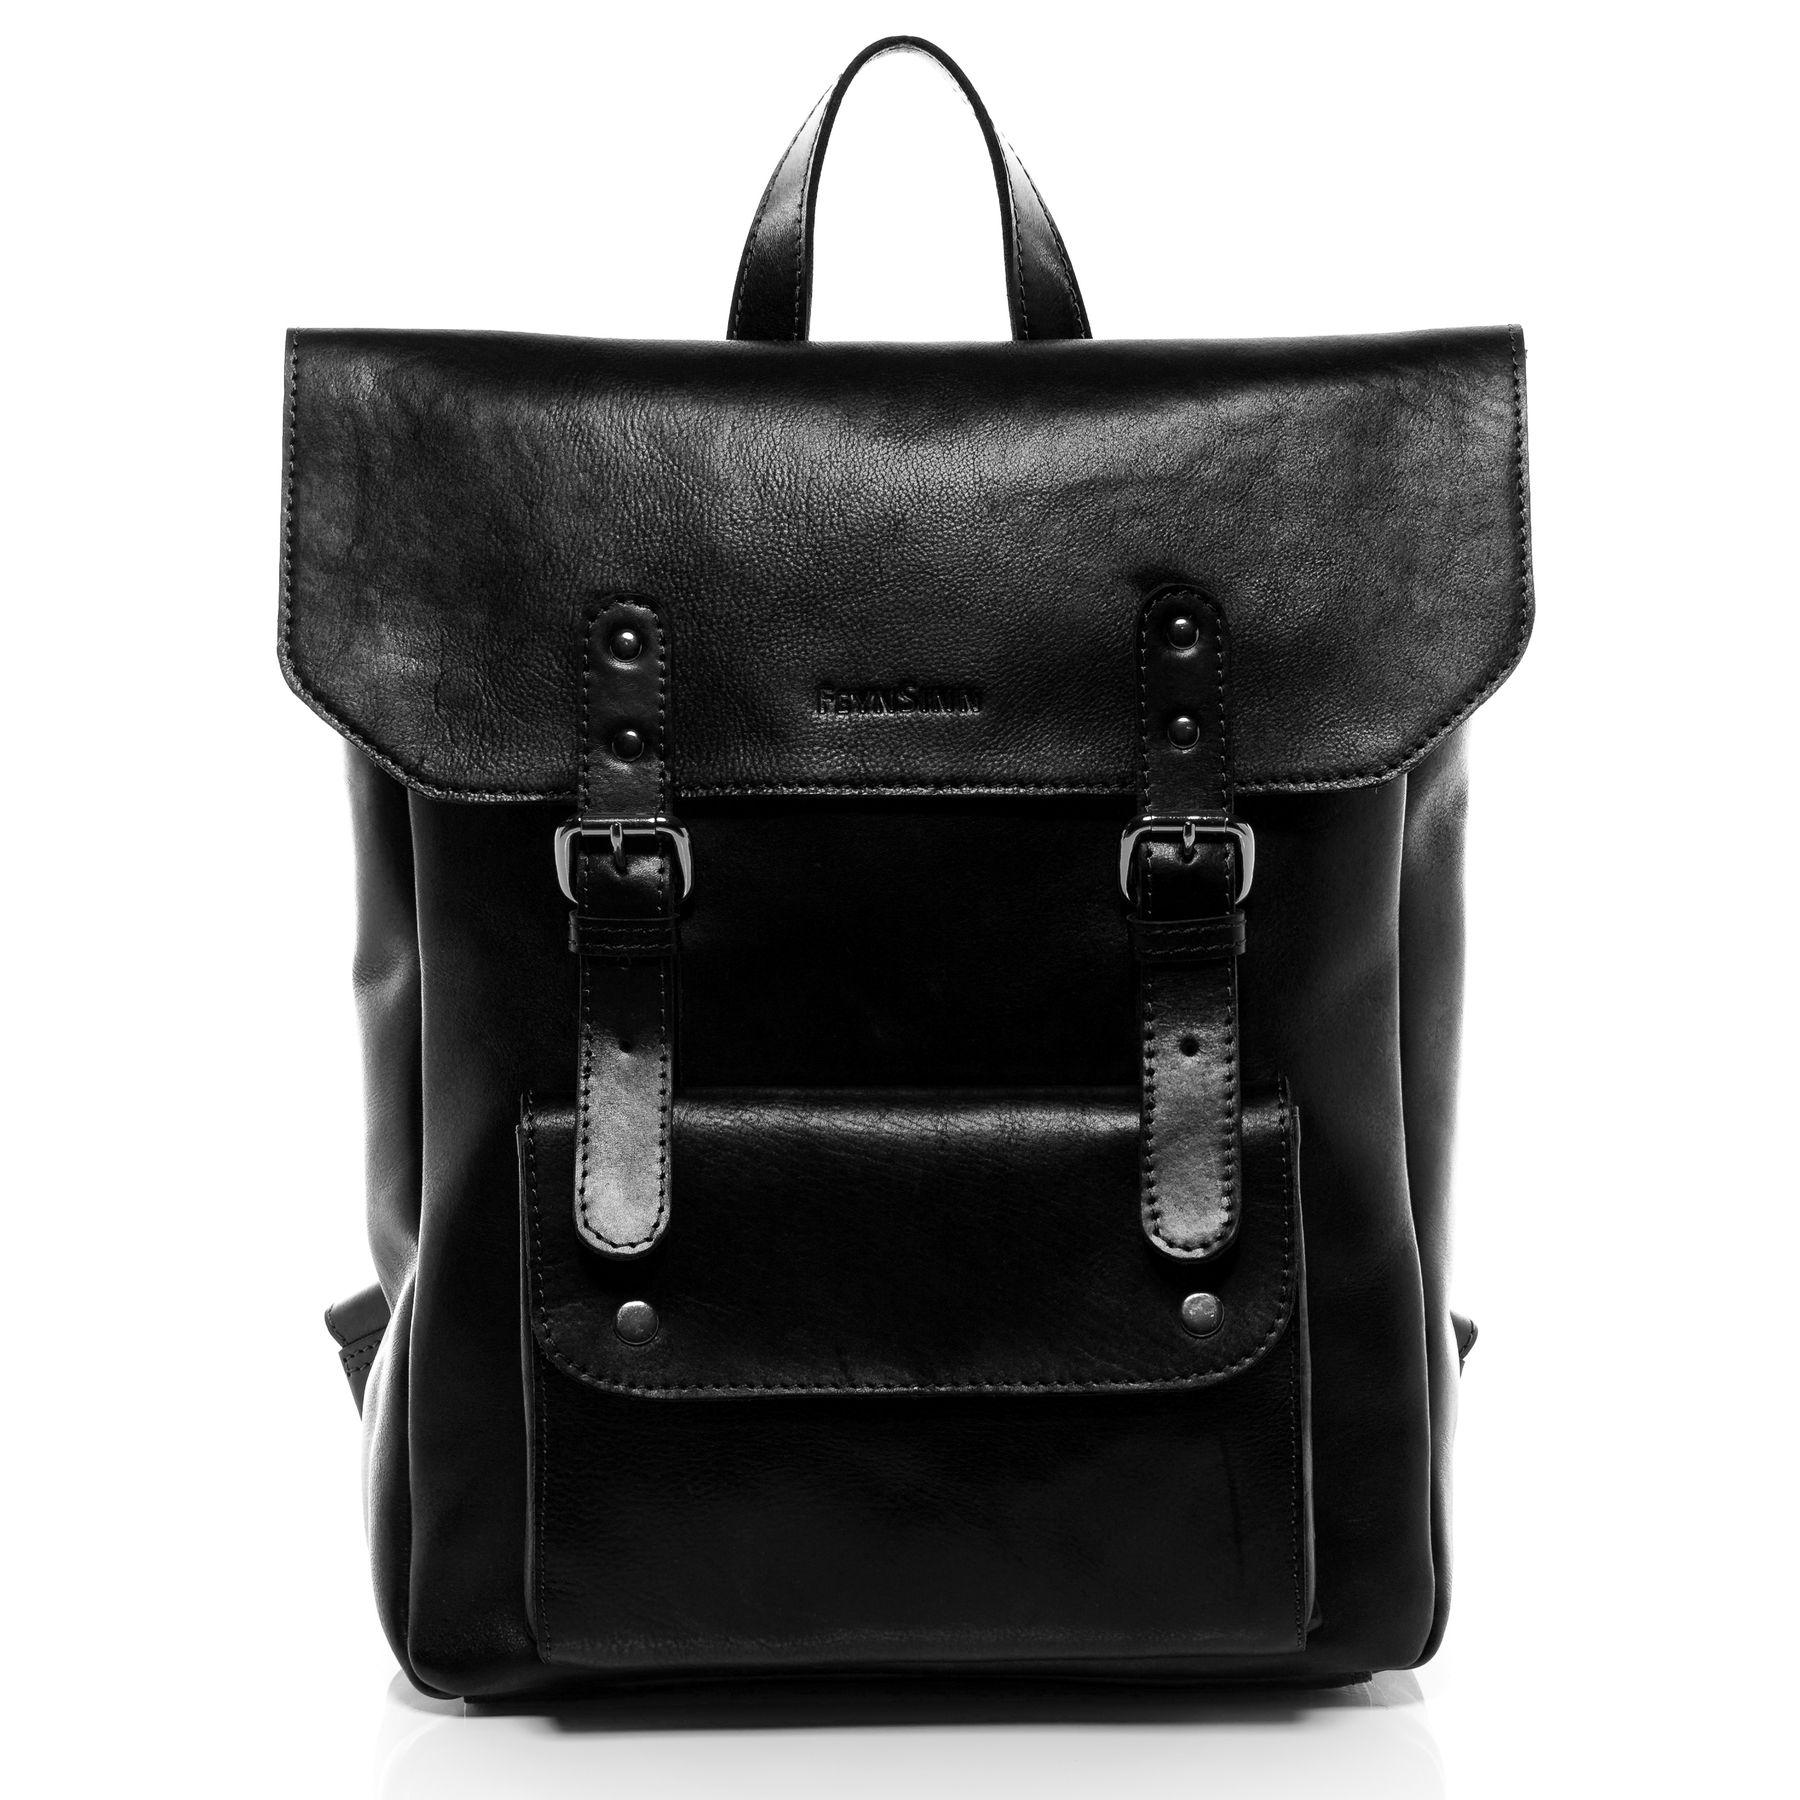 12c9527309 FEYNSINN sac à dos mince cuir noir sacs portés dos backpack ville voyage  scolaire Sacs Sacs homme